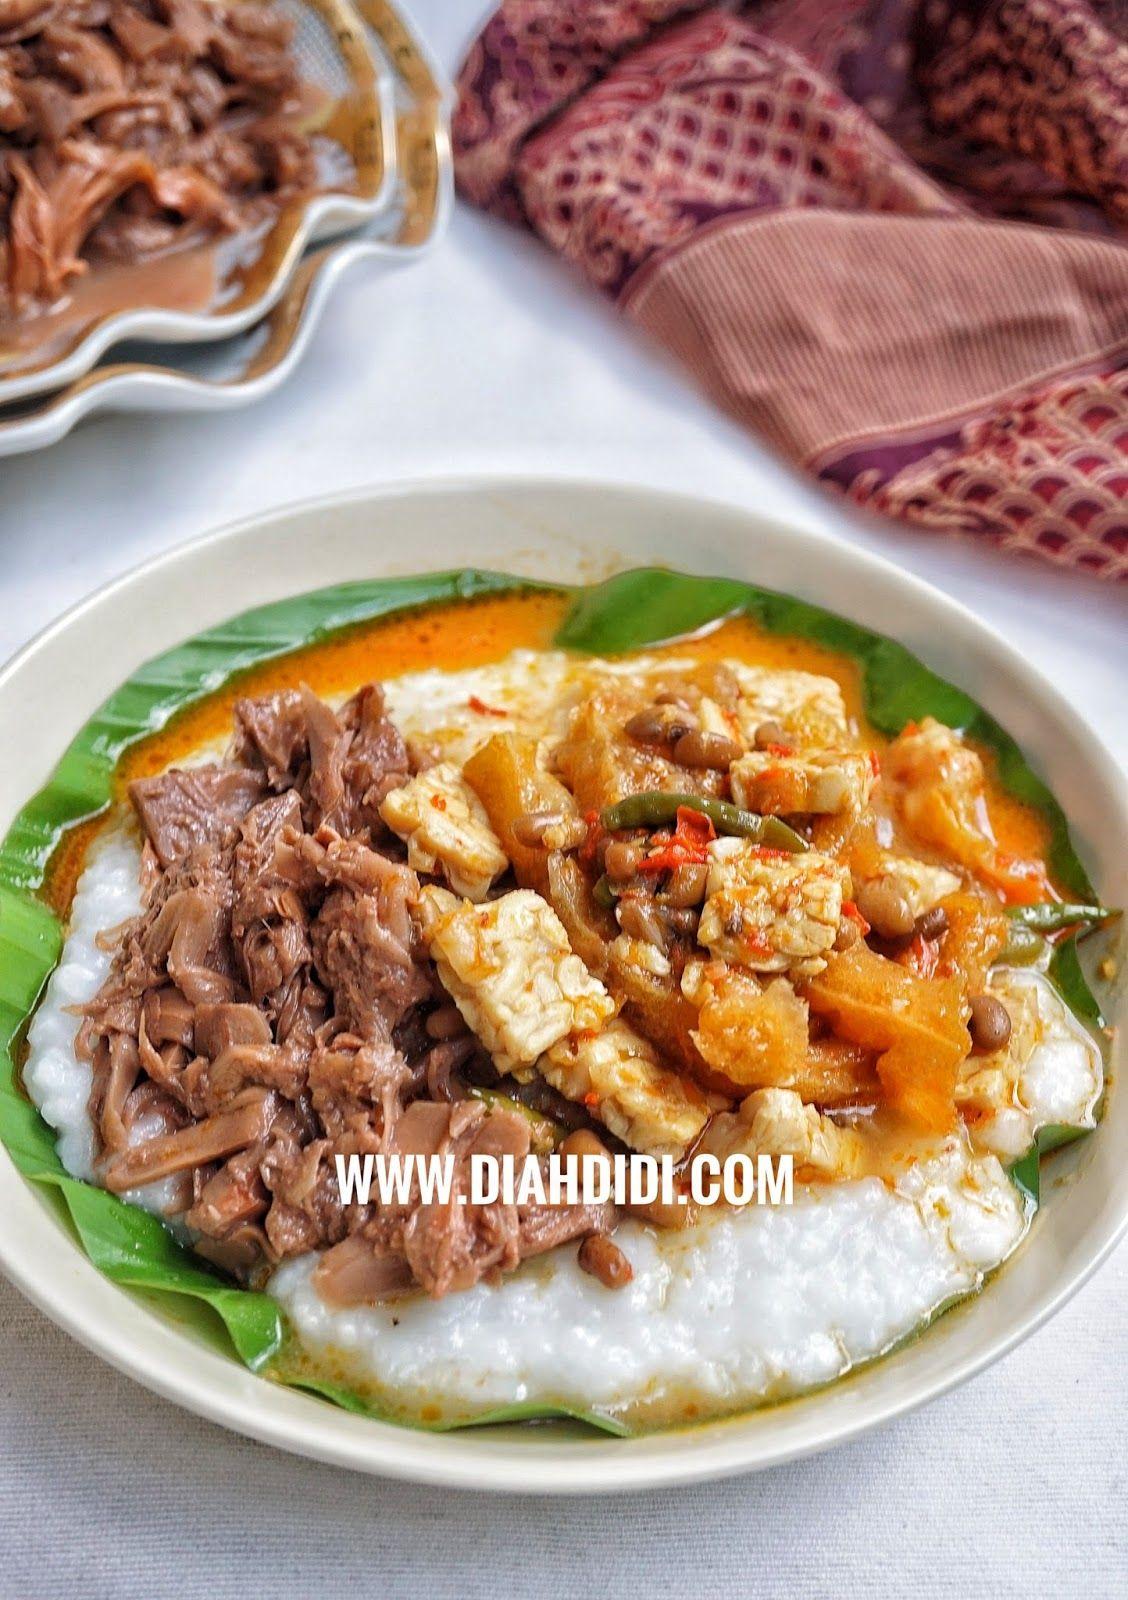 Blog Diah Didi Berisi Resep Masakan Praktis Yang Mudah Dipraktekkan Di Rumah Masakan Resep Masakan Resep